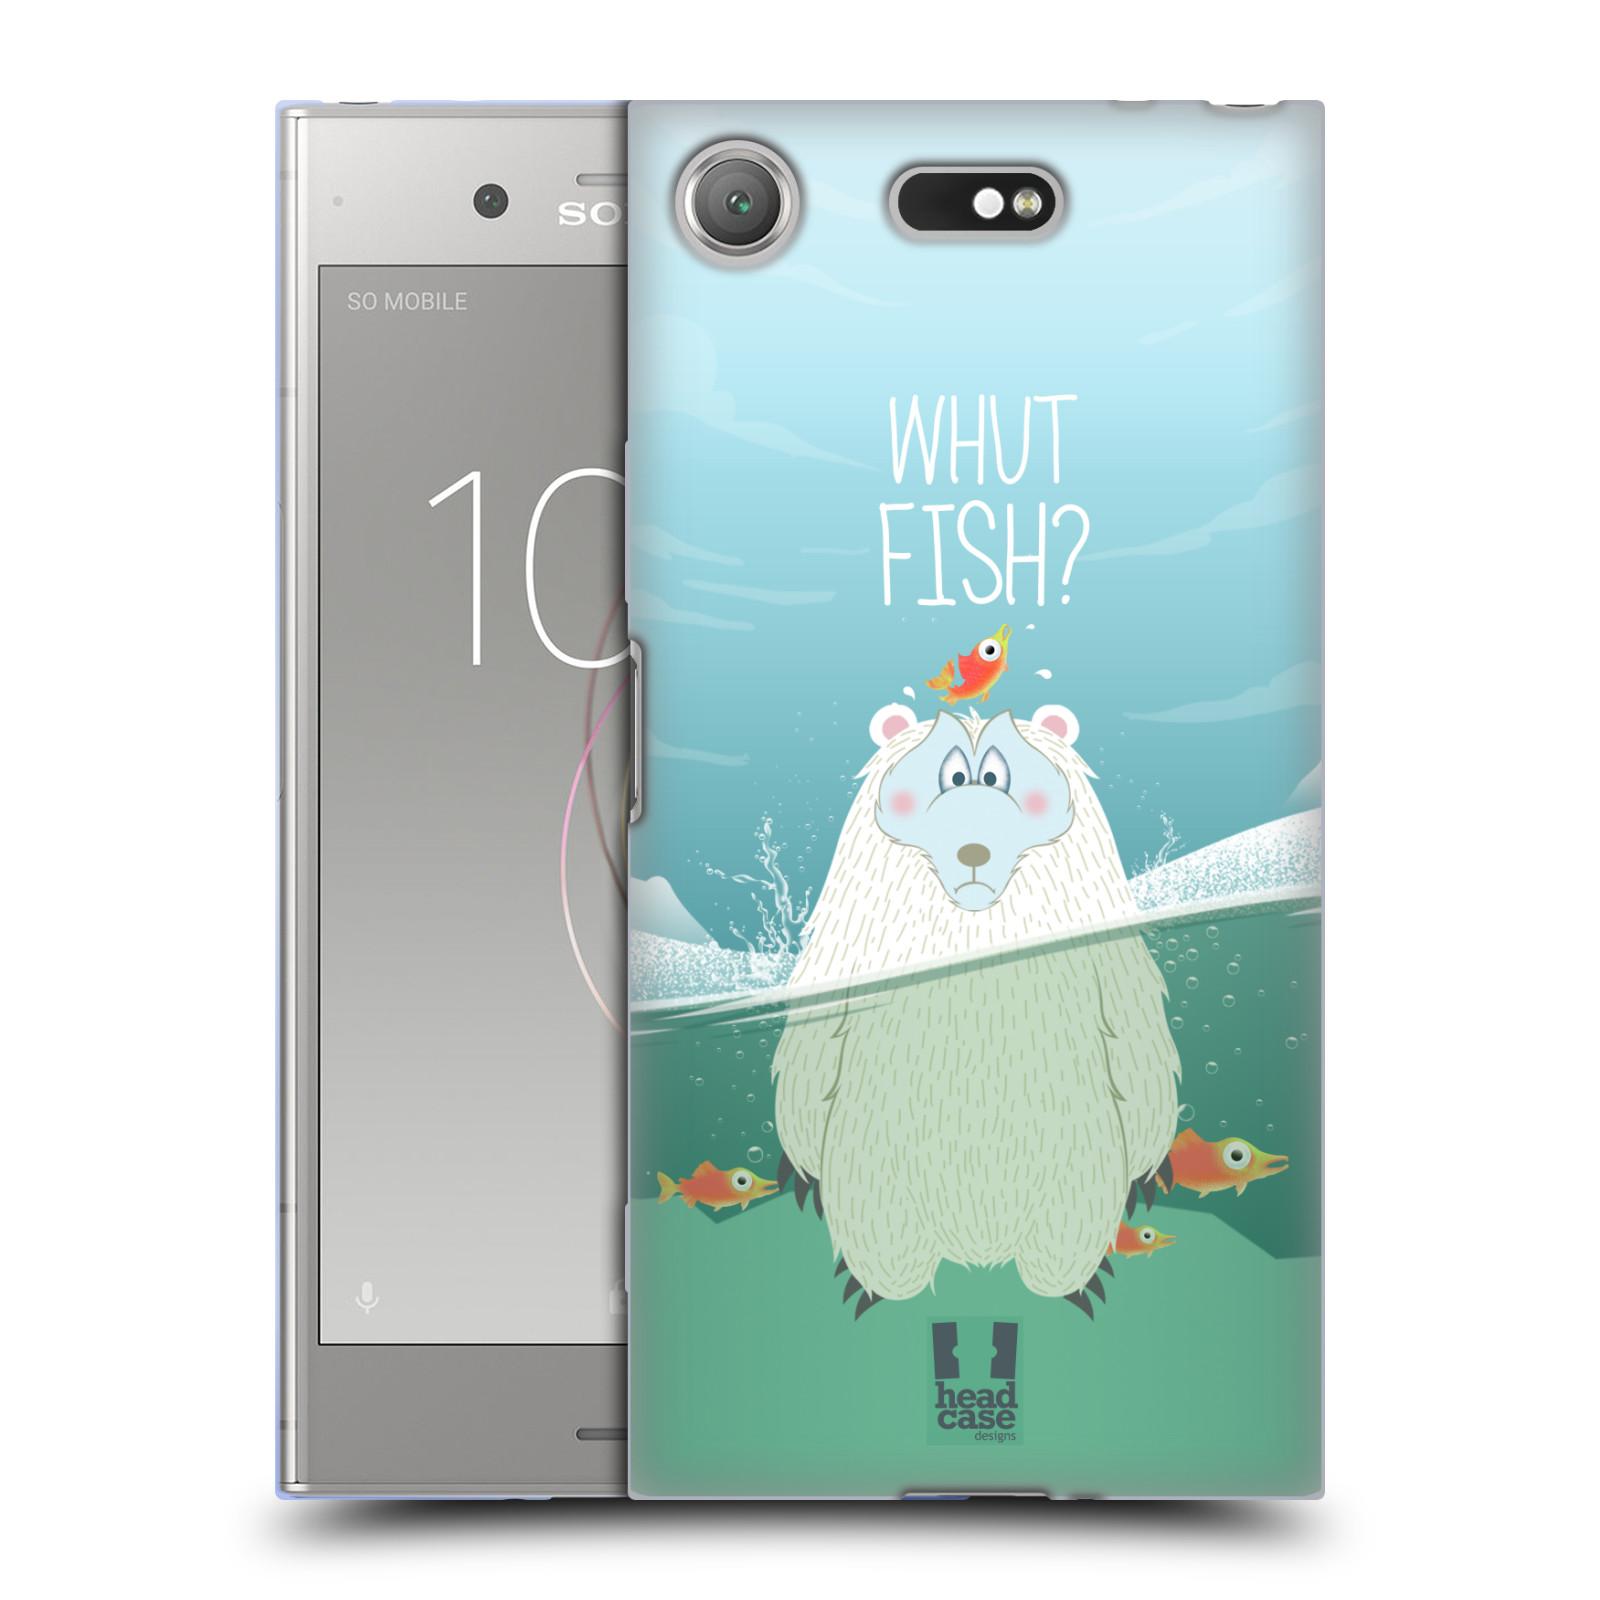 Silikonové pouzdro na mobil Sony Xperia XZ1 Compact - Head Case - Medvěd Whut Fish?